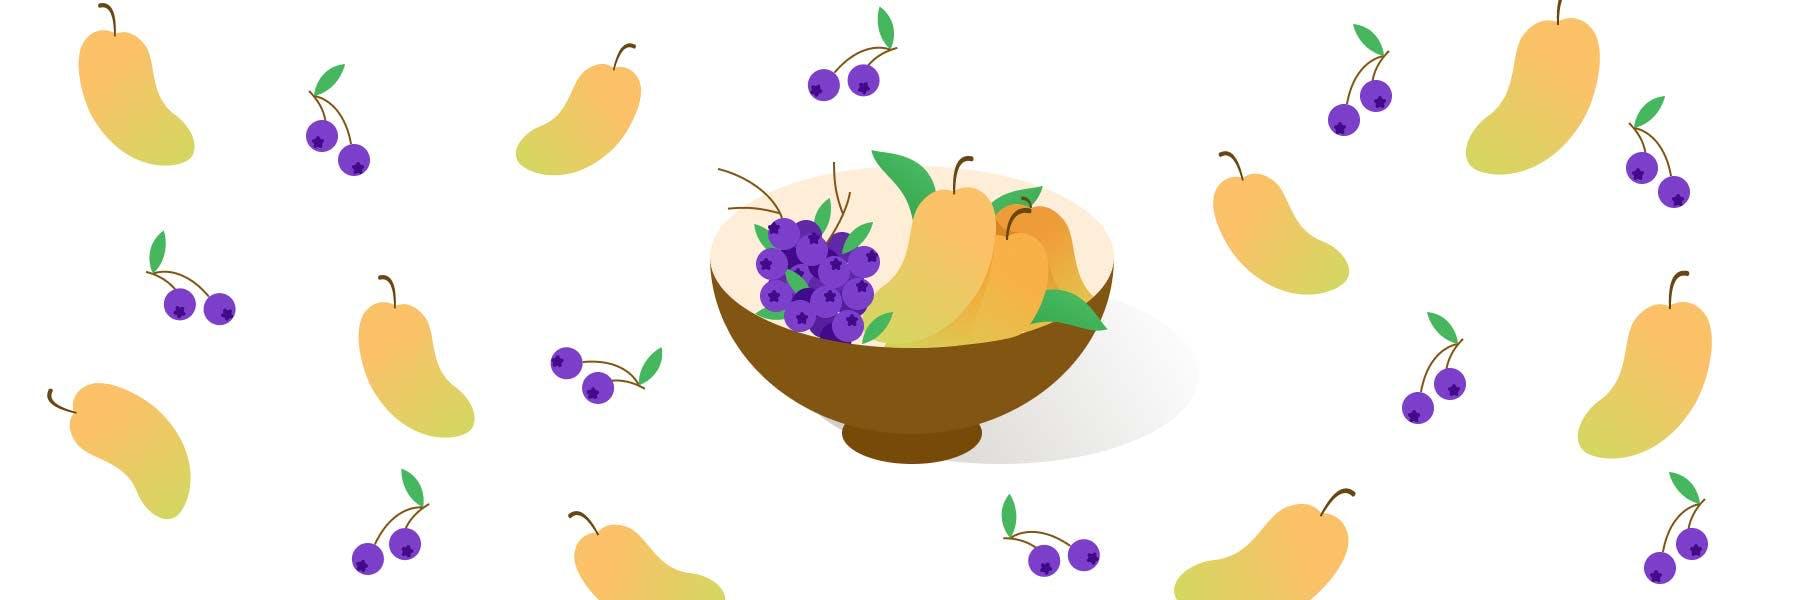 Debranding our self branding via blueberries and mangos